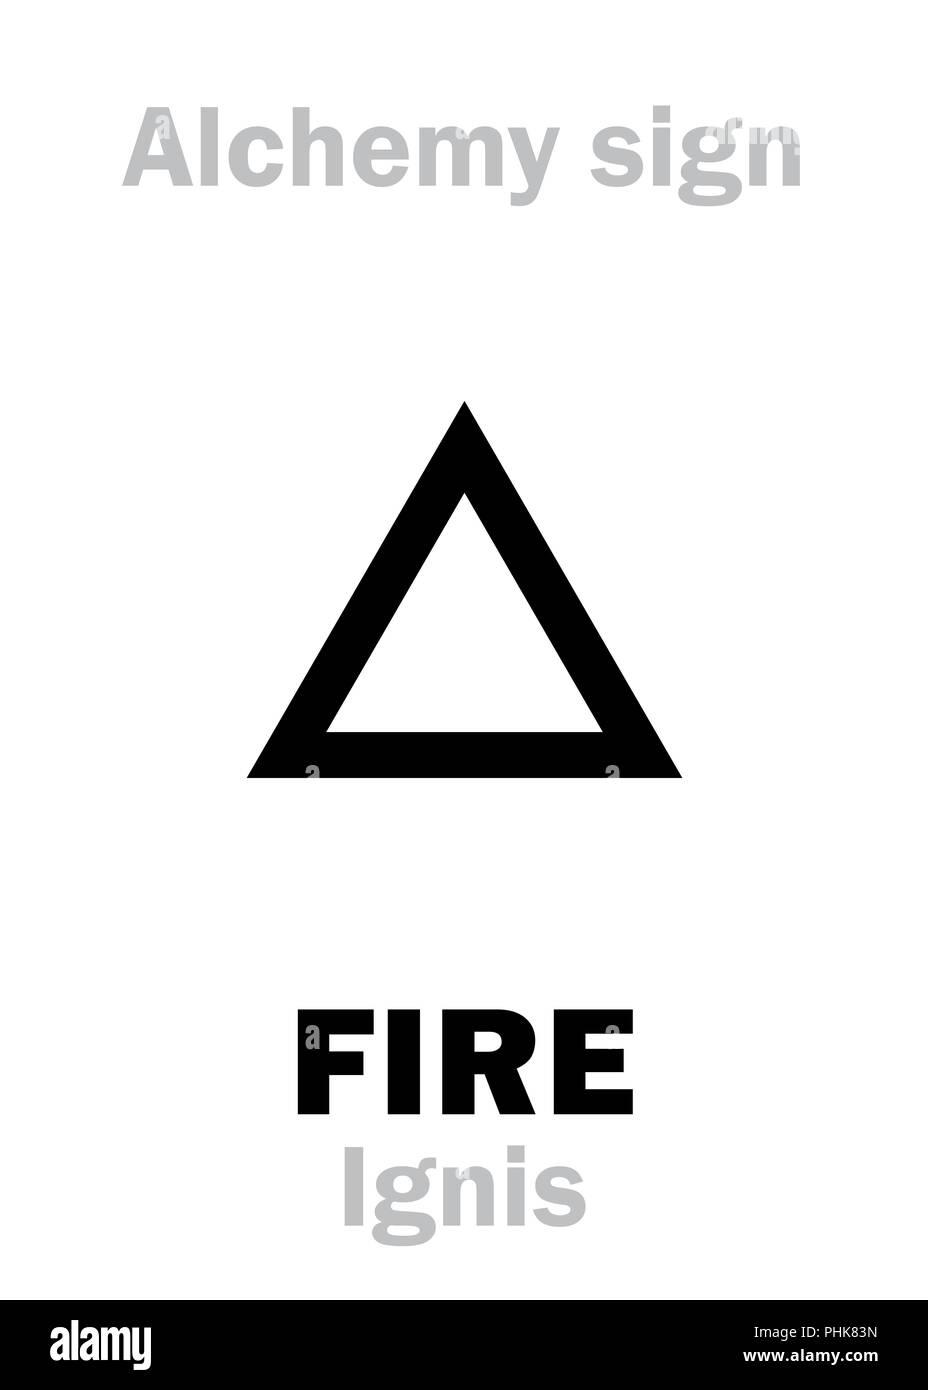 Alchemy: FIRE (Ignis) - Stock Image